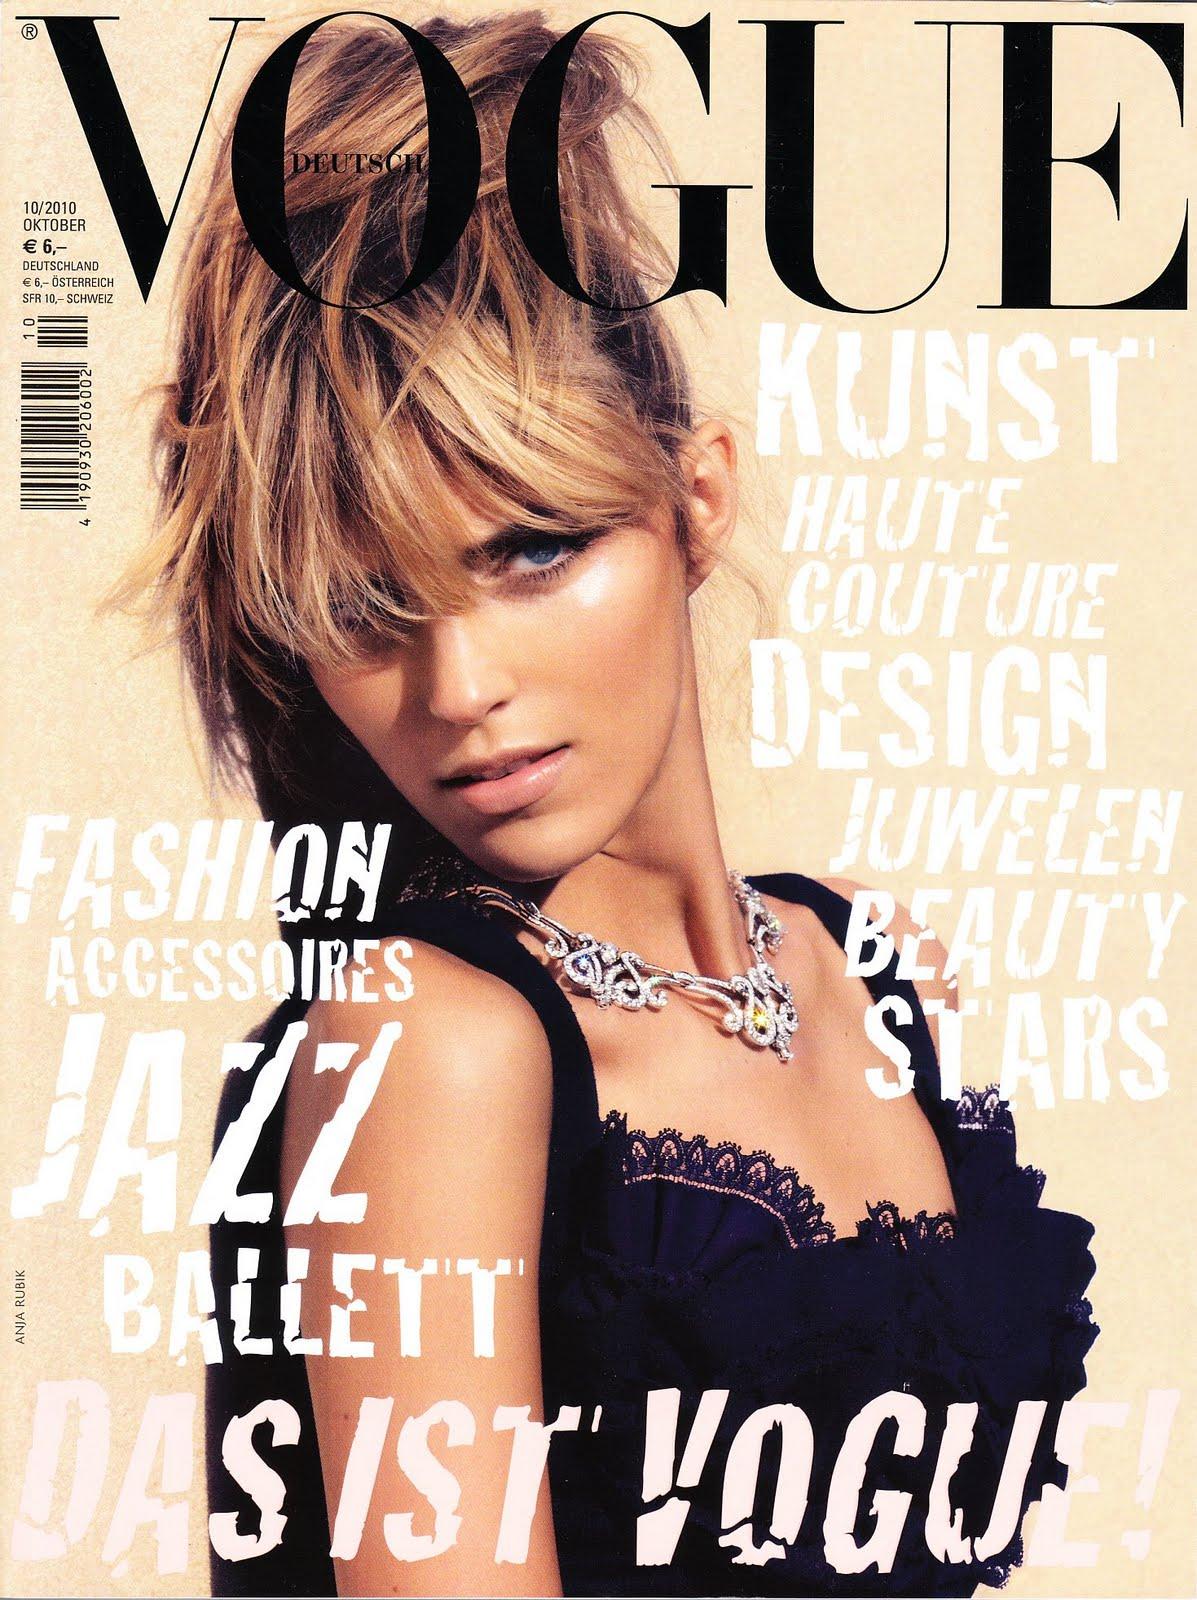 http://1.bp.blogspot.com/_e0DkE-3x4L4/TM1GhHKv01I/AAAAAAAAEIs/hmZG14Qyc8k/s1600/Anja+Rubik+Vogue+Germany.jpg